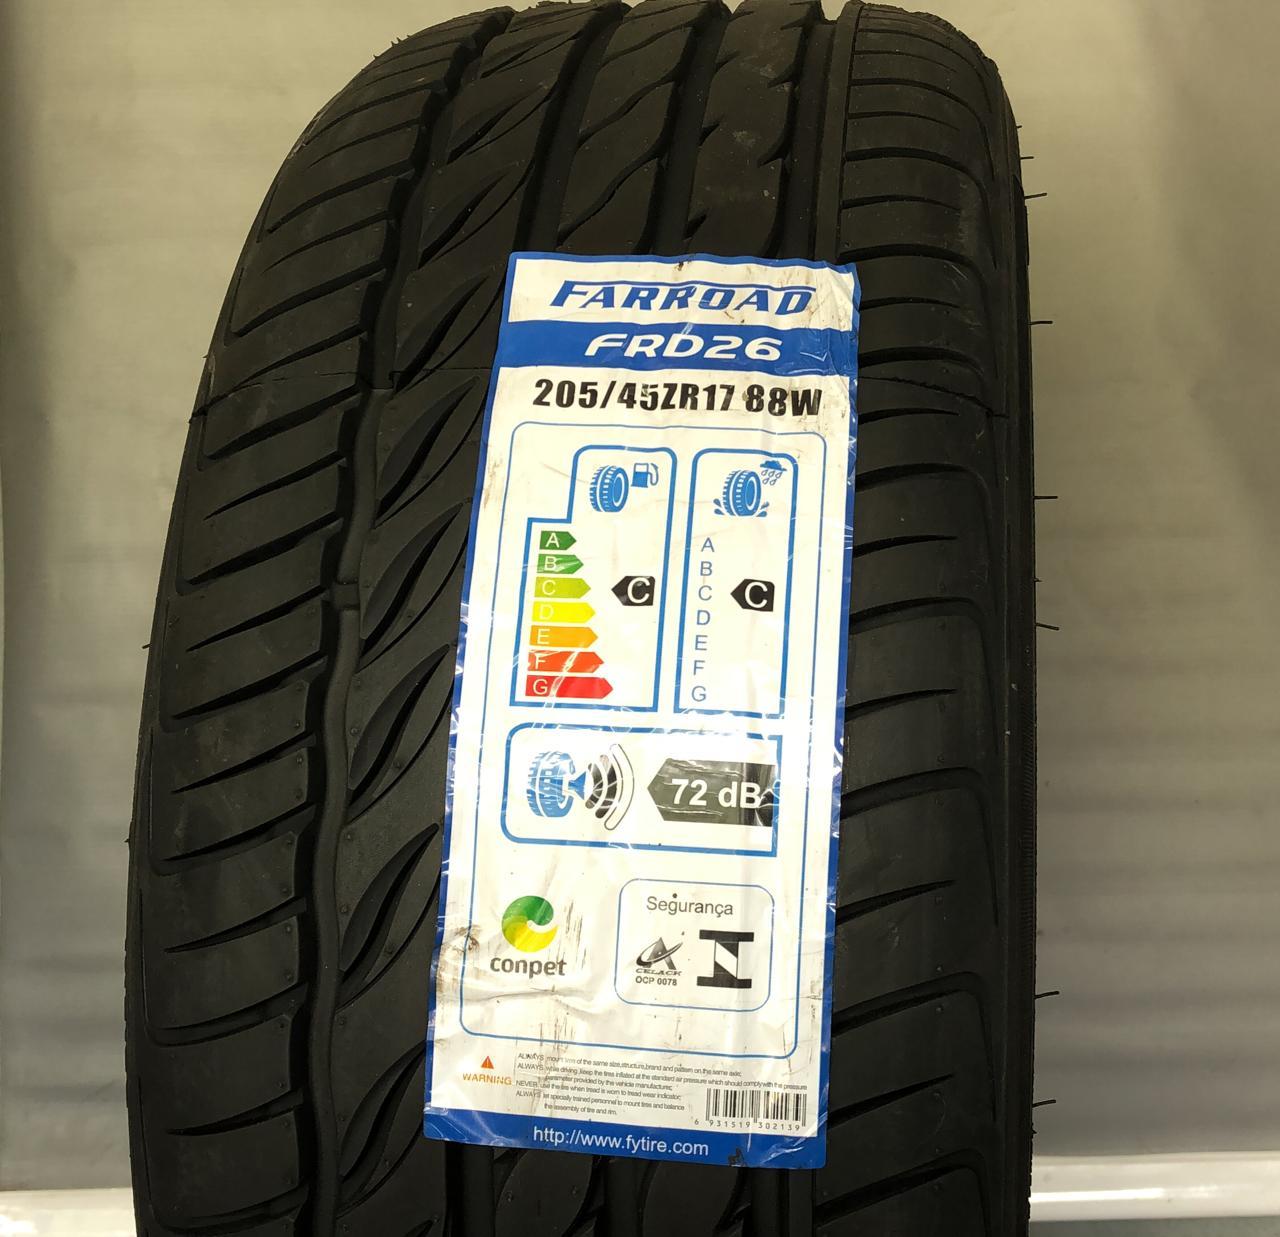 PNEU FARROAD 205/45 R17 FRD26 XL 88W